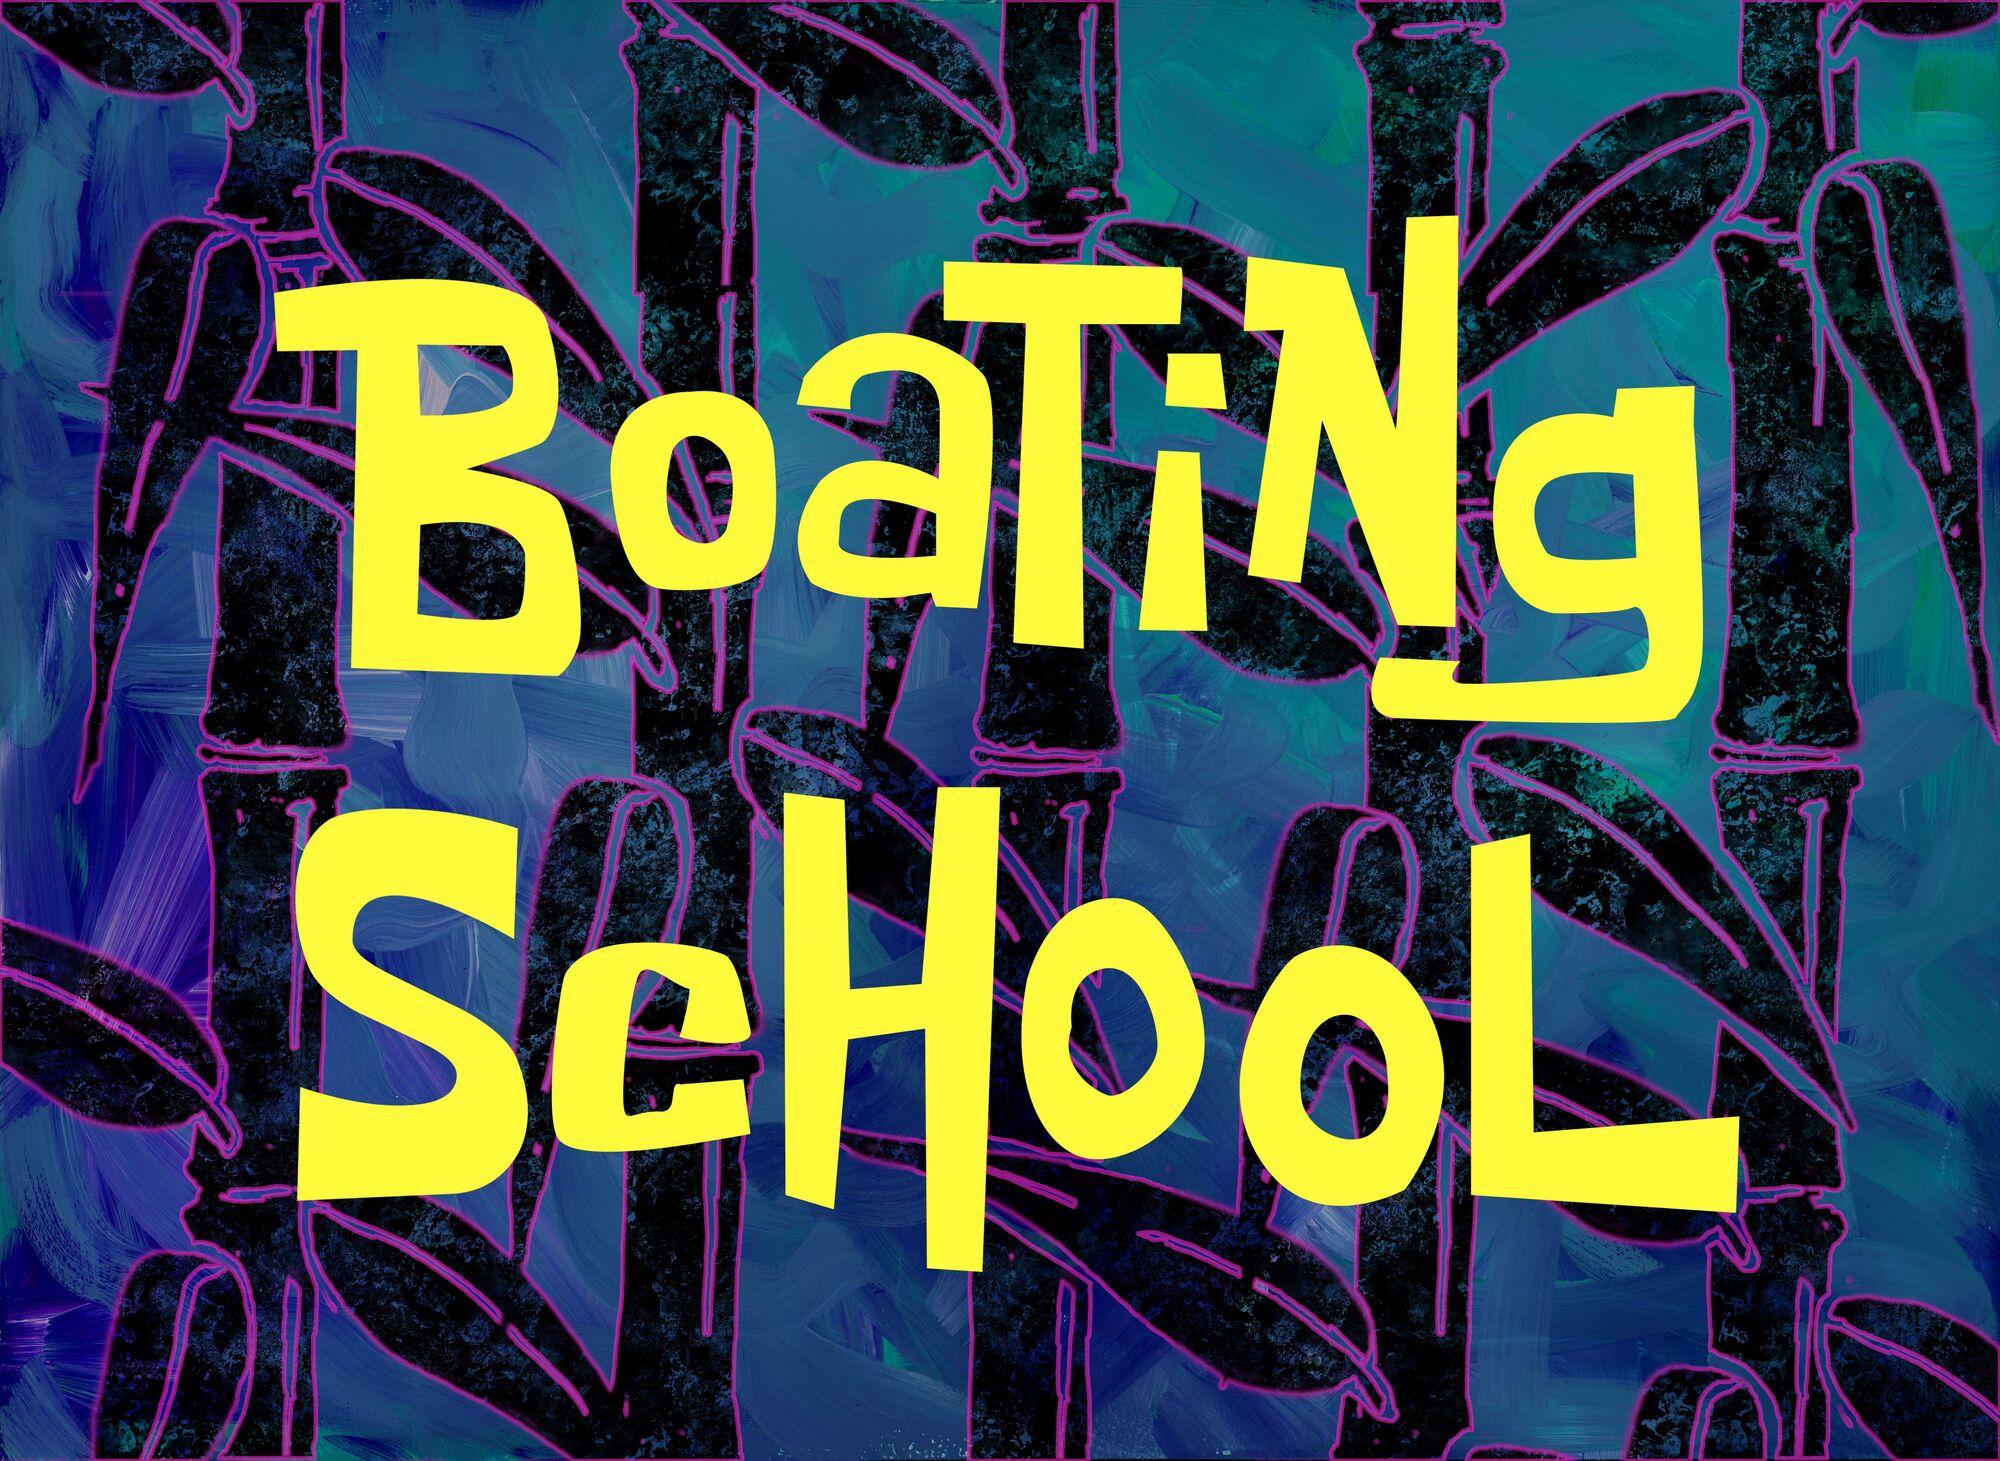 Boating School | Encyclopedia SpongeBobia | FANDOM powered